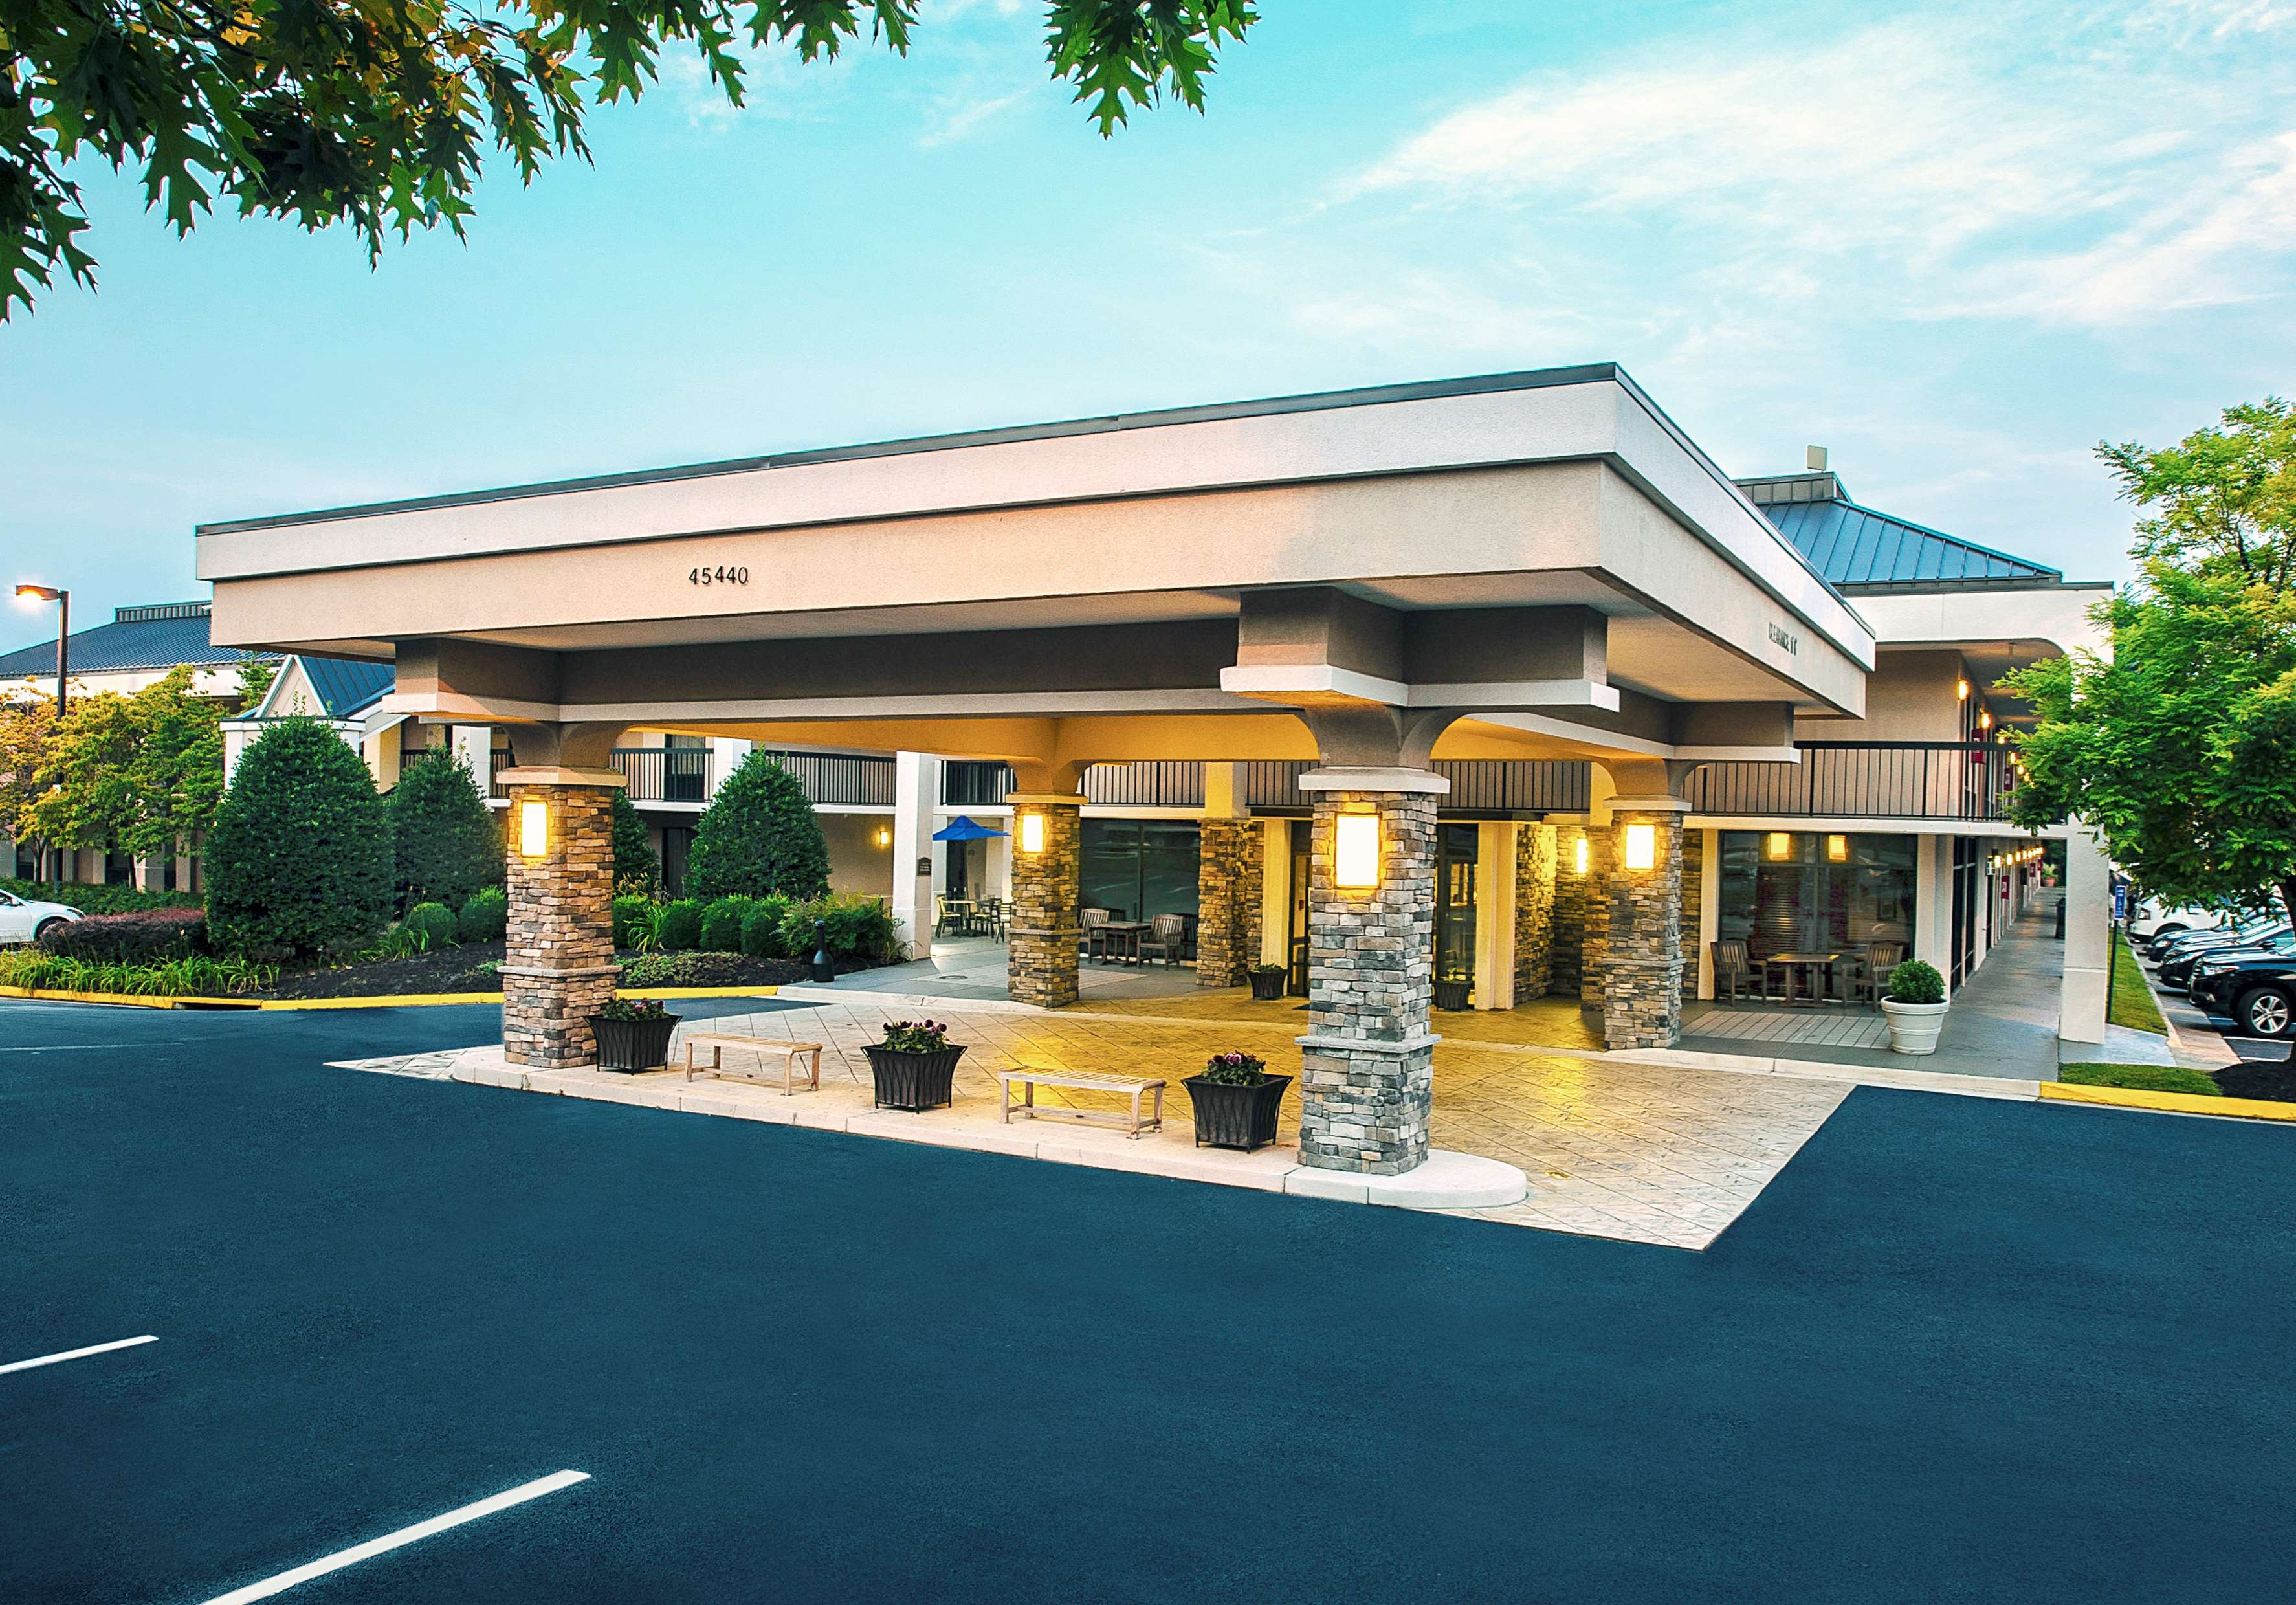 Best Western Dulles Airport Inn image 0